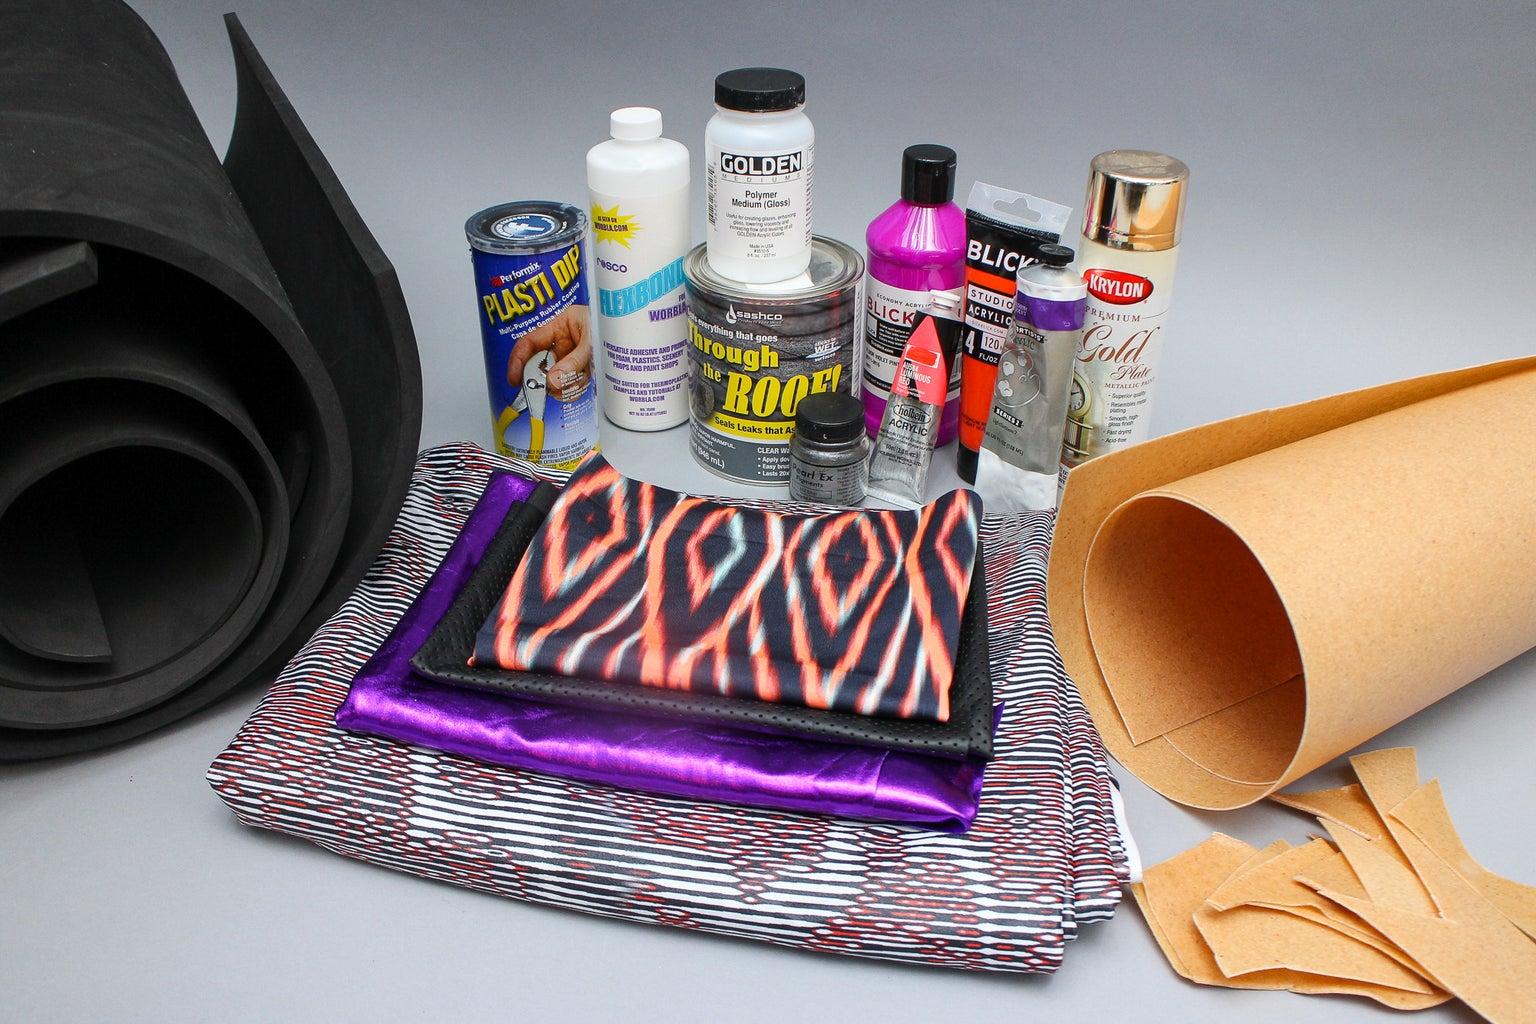 Materials for Superhero Costume Construction